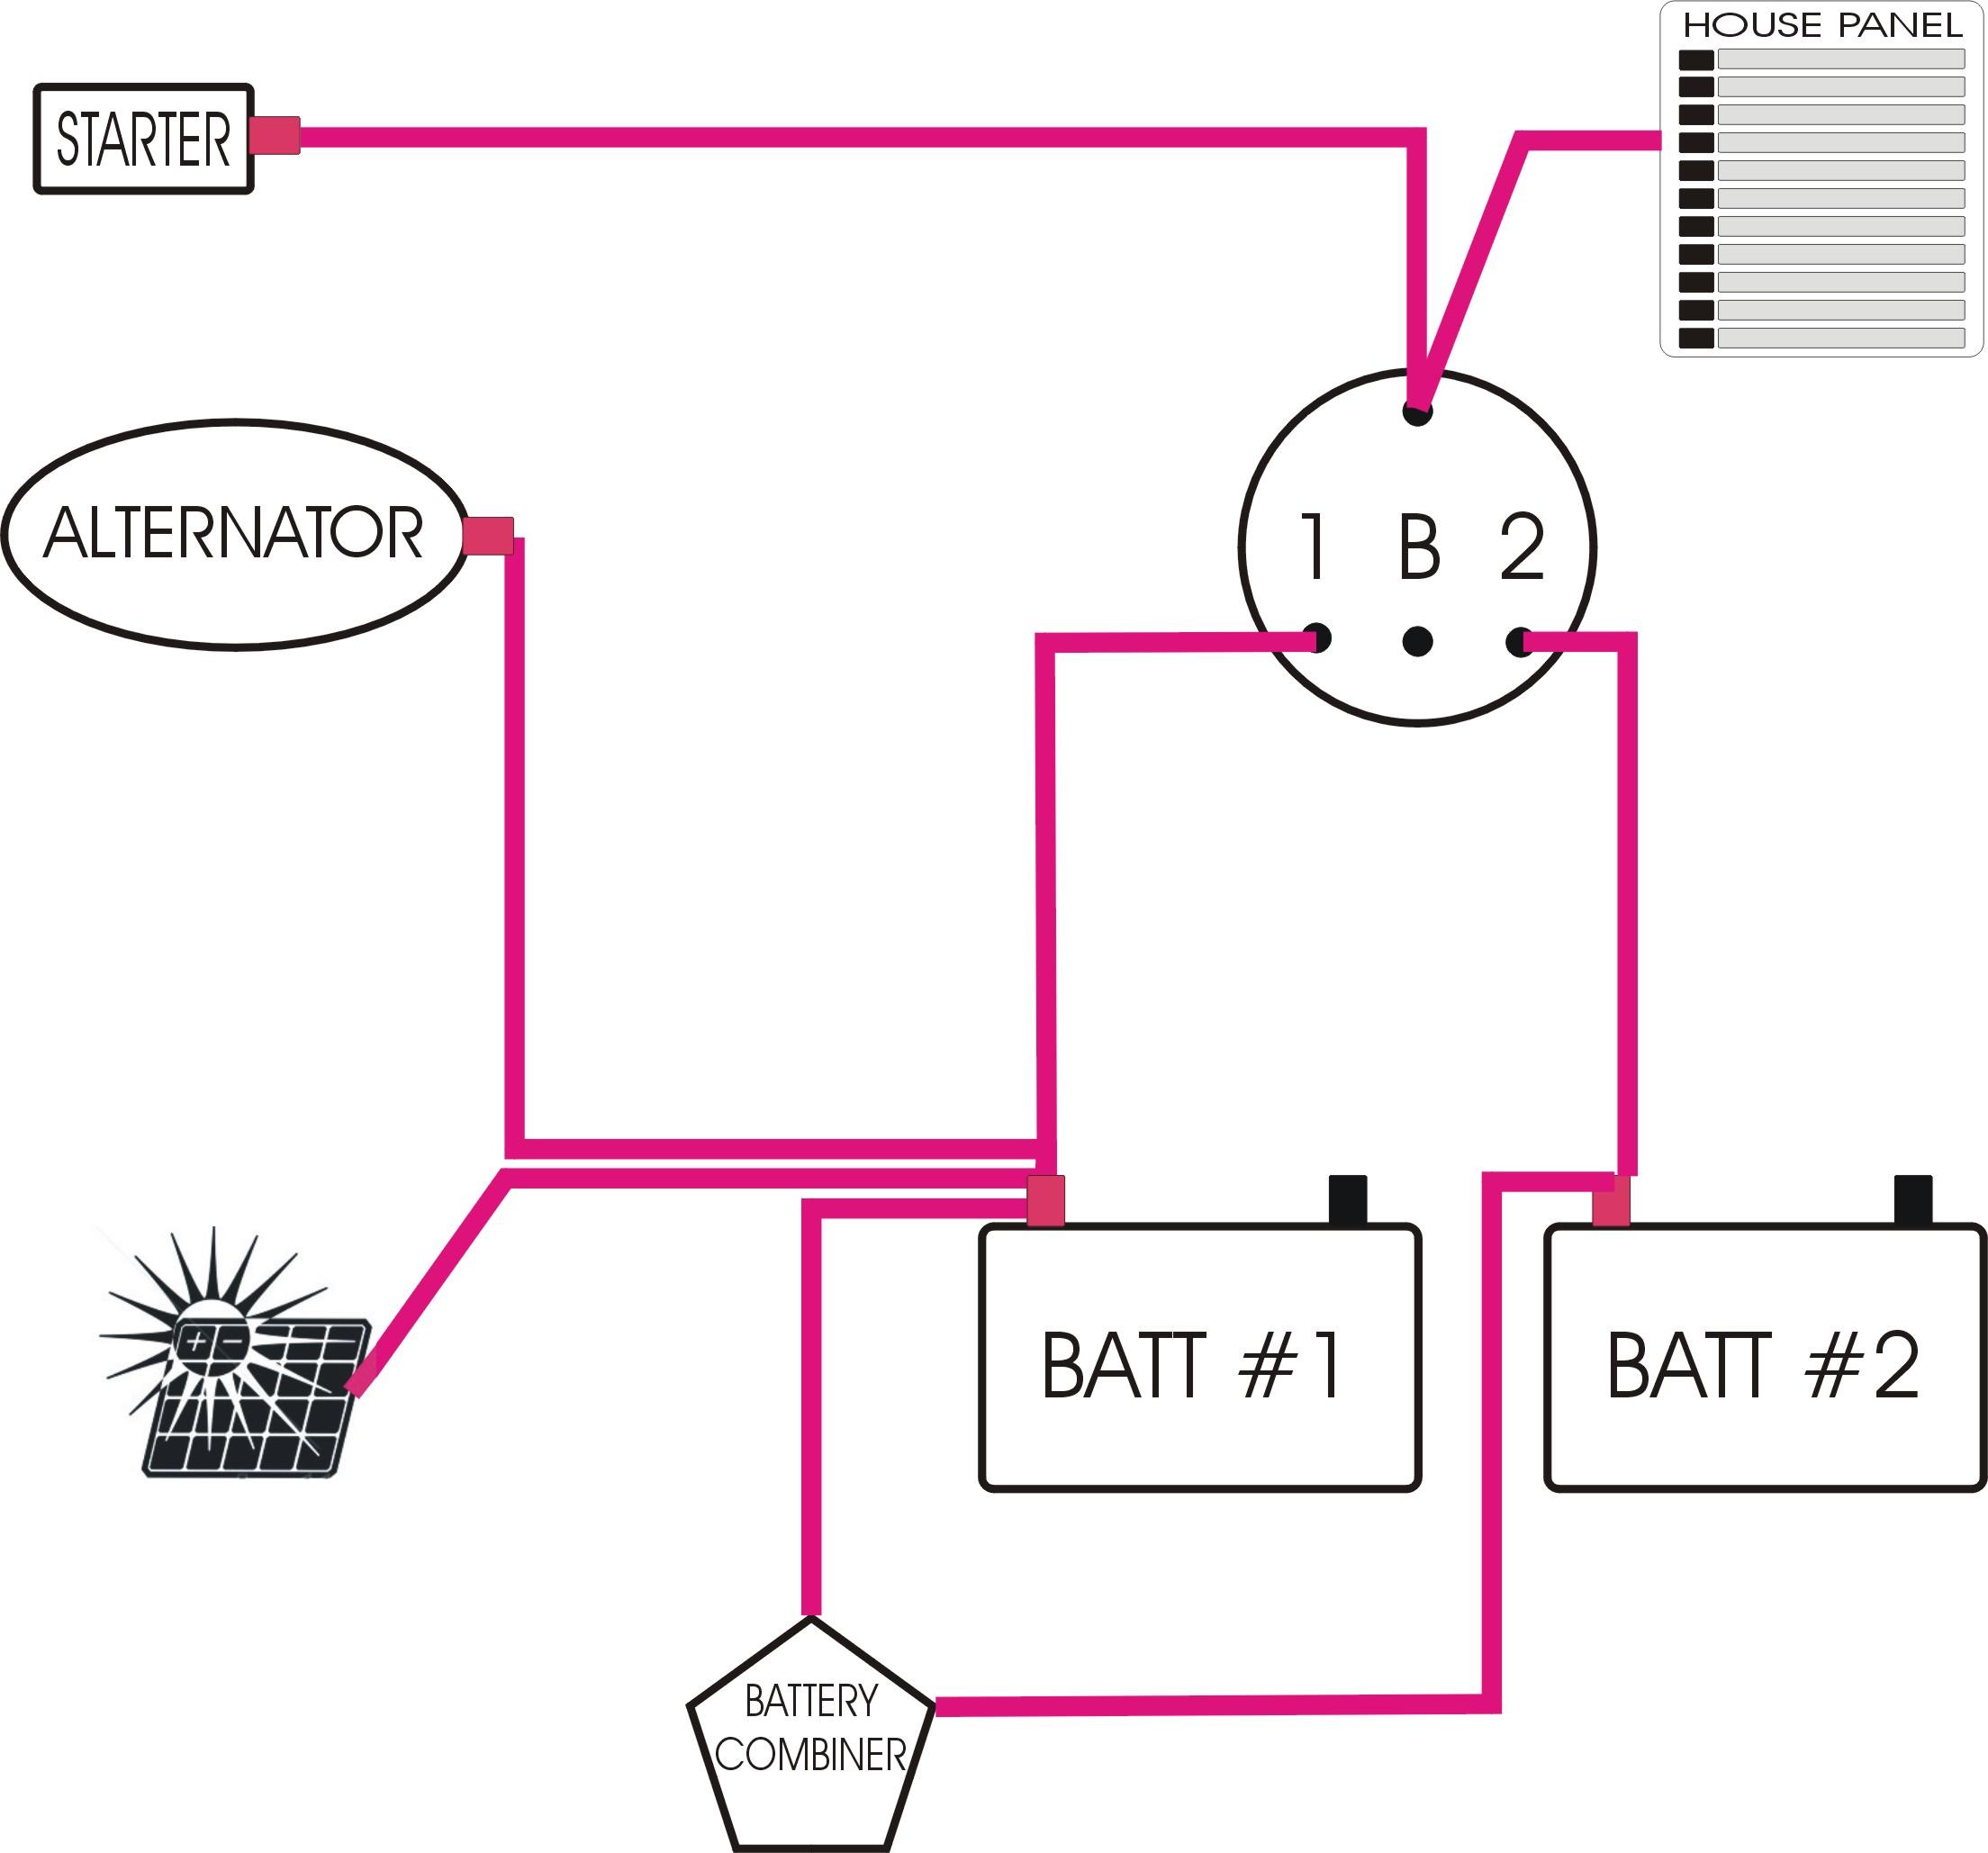 battery_wiring_diag.jpg. Battery Charging | SailboatOwners.com Forums  battery_wiring_diag.jpg. Catalina 30 Wiring Diagram ...